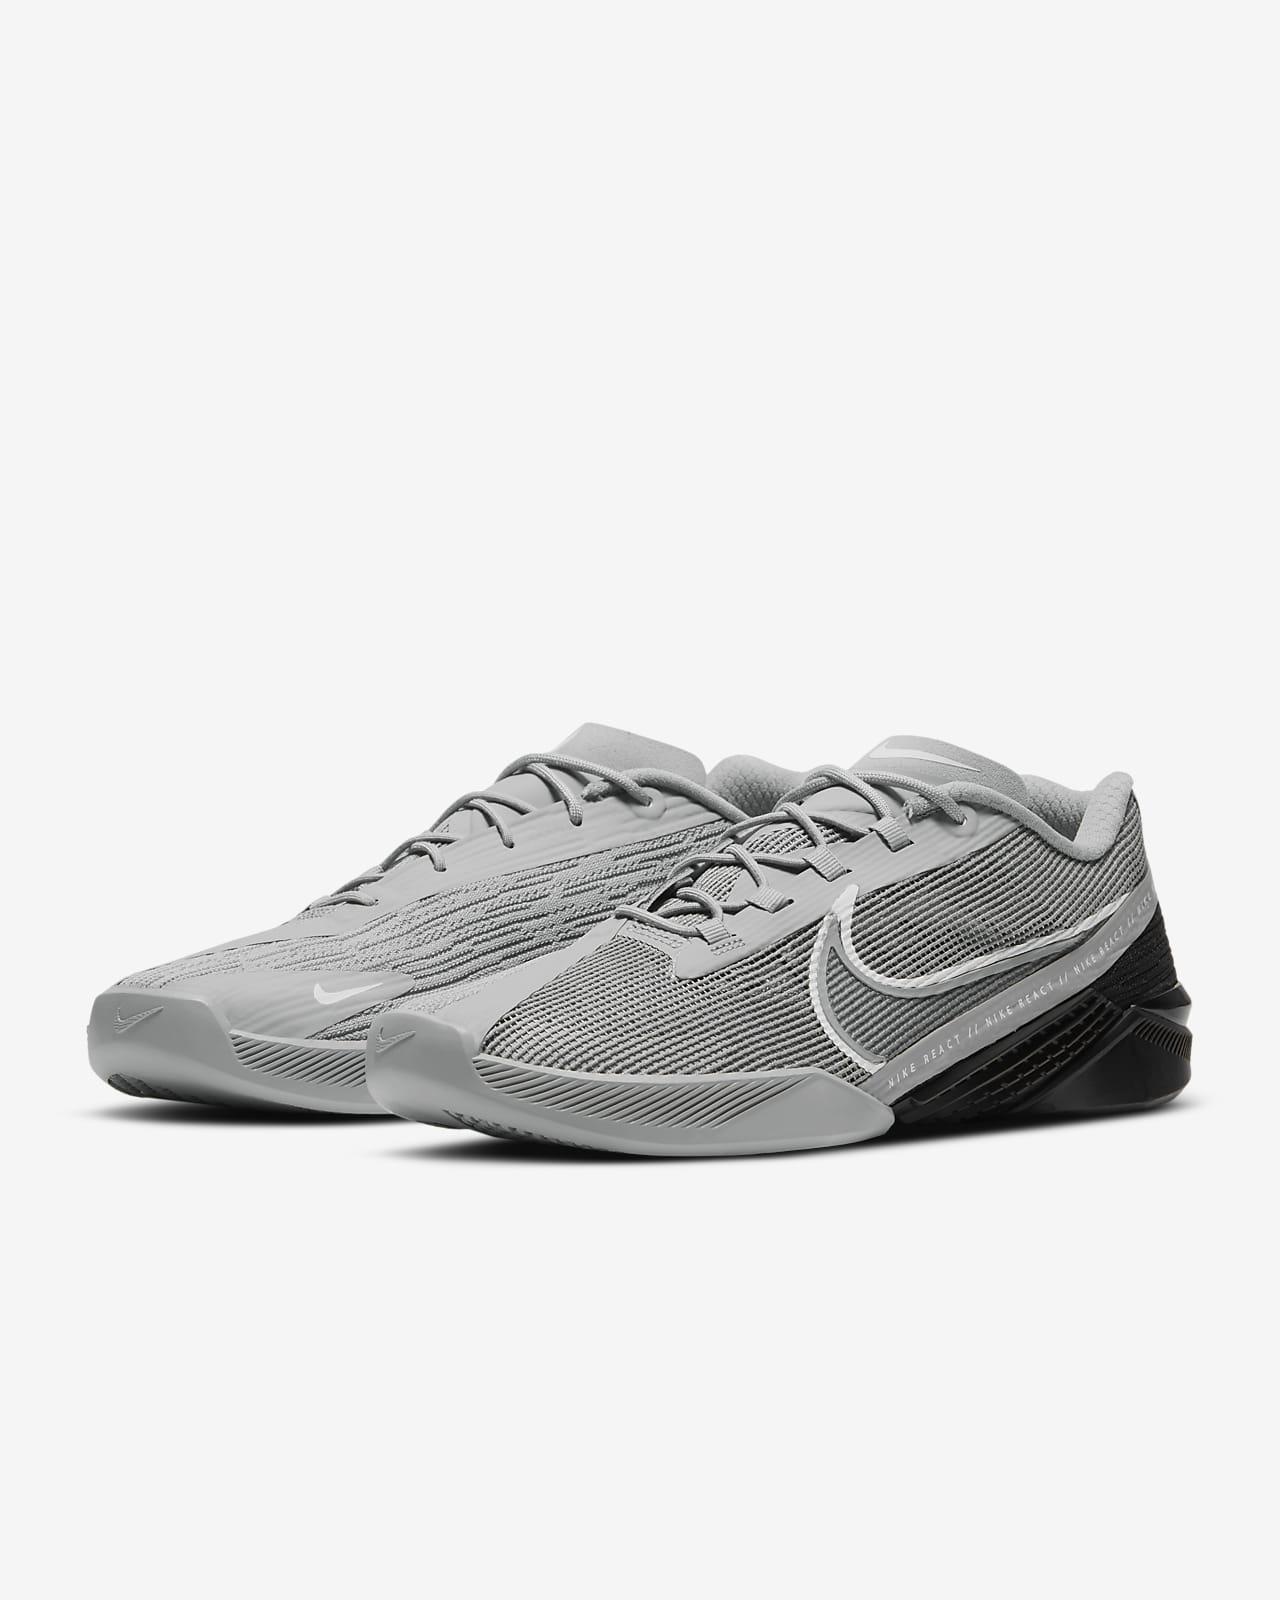 Nike React Metcon Turbo Training Shoes. Nike LU